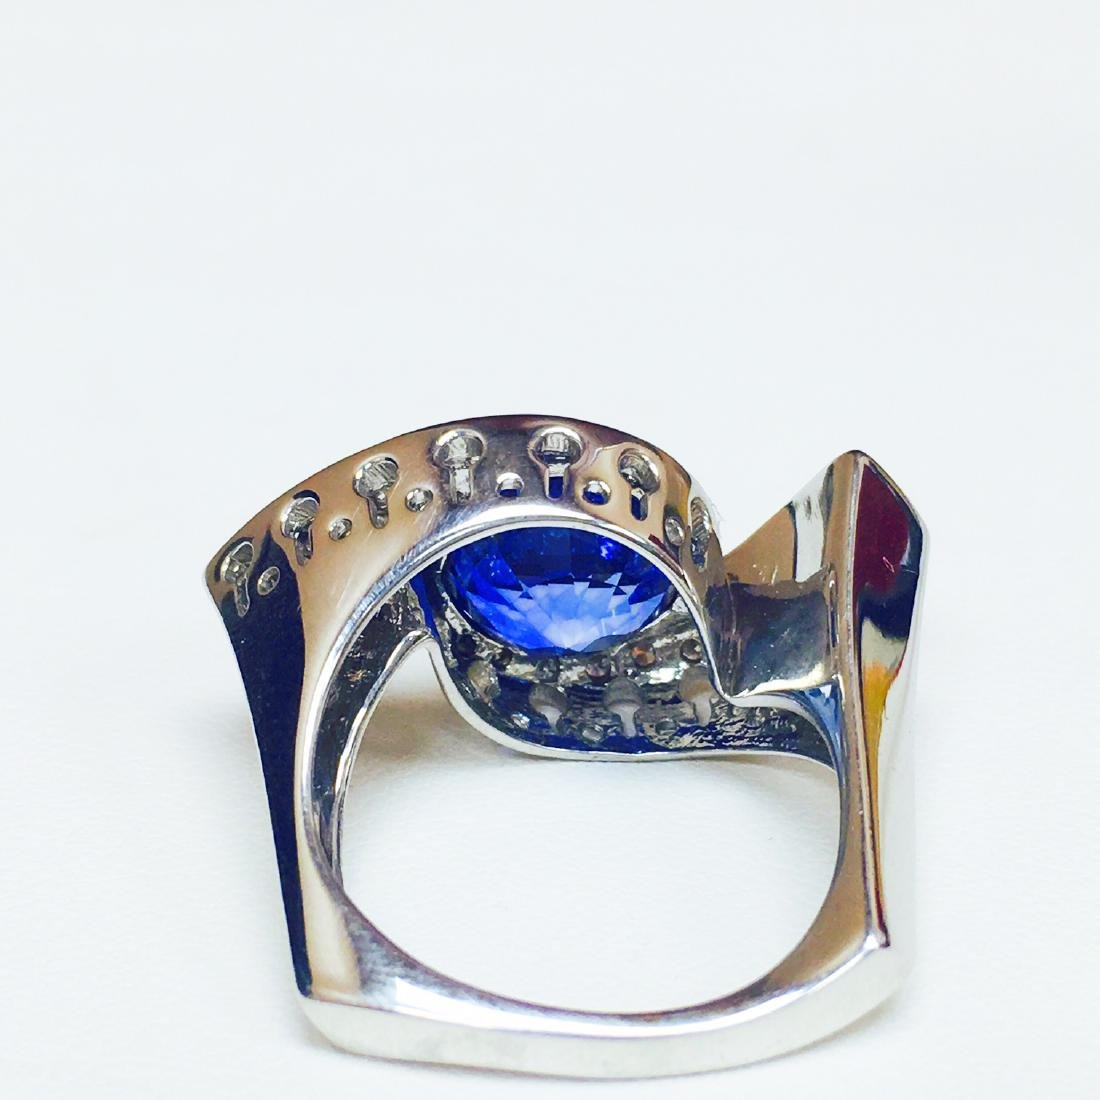 6.00 Carat Blue Sapphire & DIAMOND EVIL EYE STYLE RING - 4